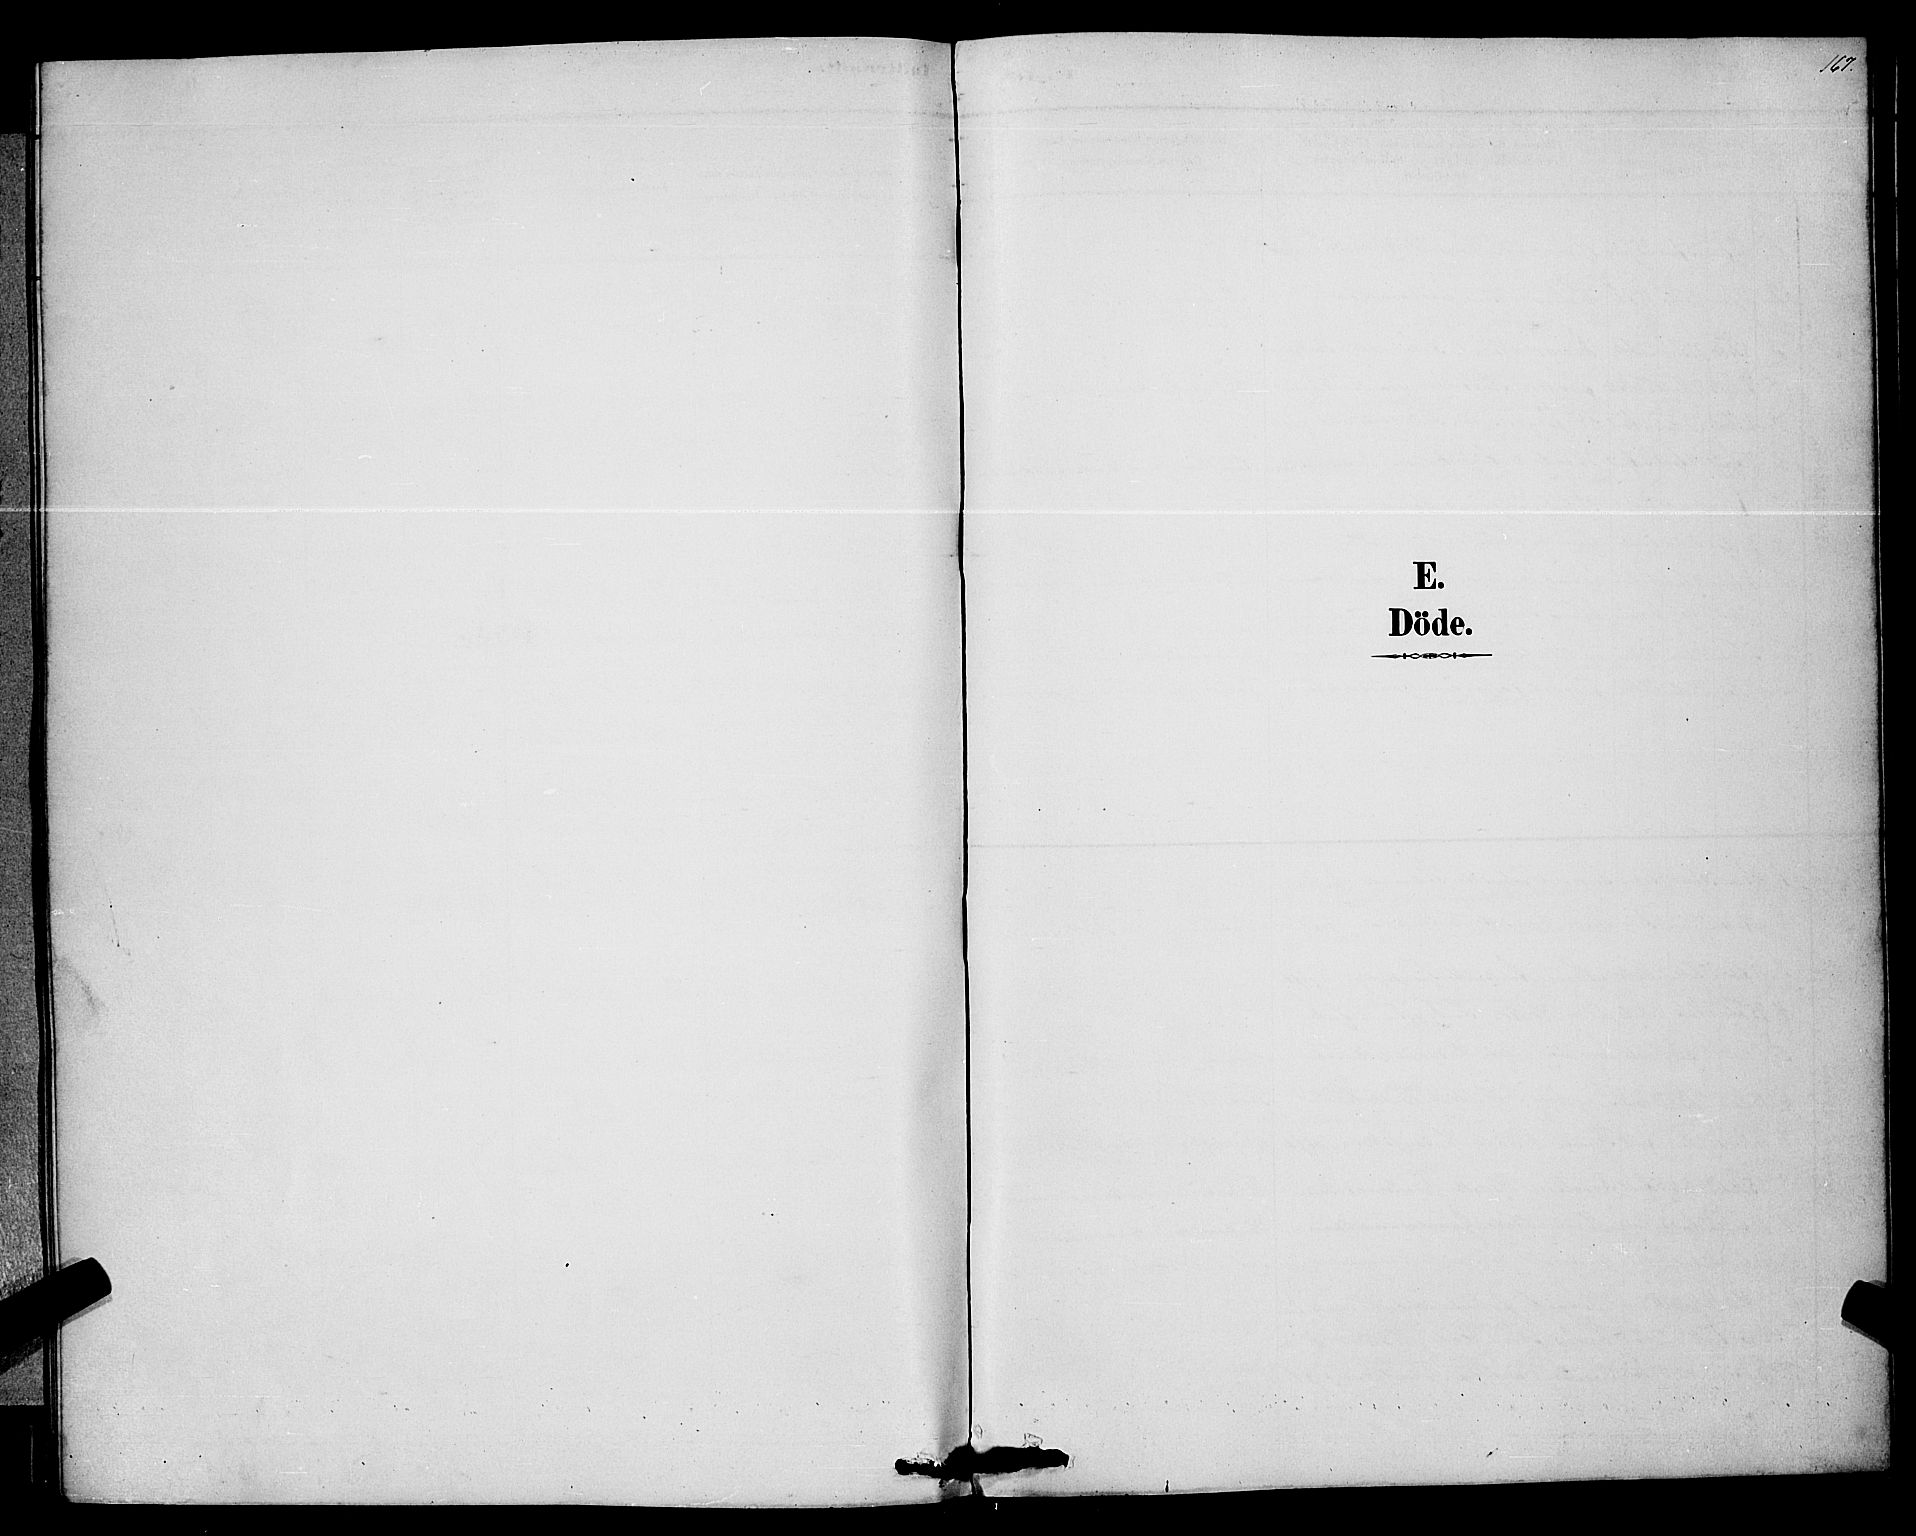 SAKO, Bø kirkebøker, G/Ga/L0005: Klokkerbok nr. 5, 1883-1897, s. 167